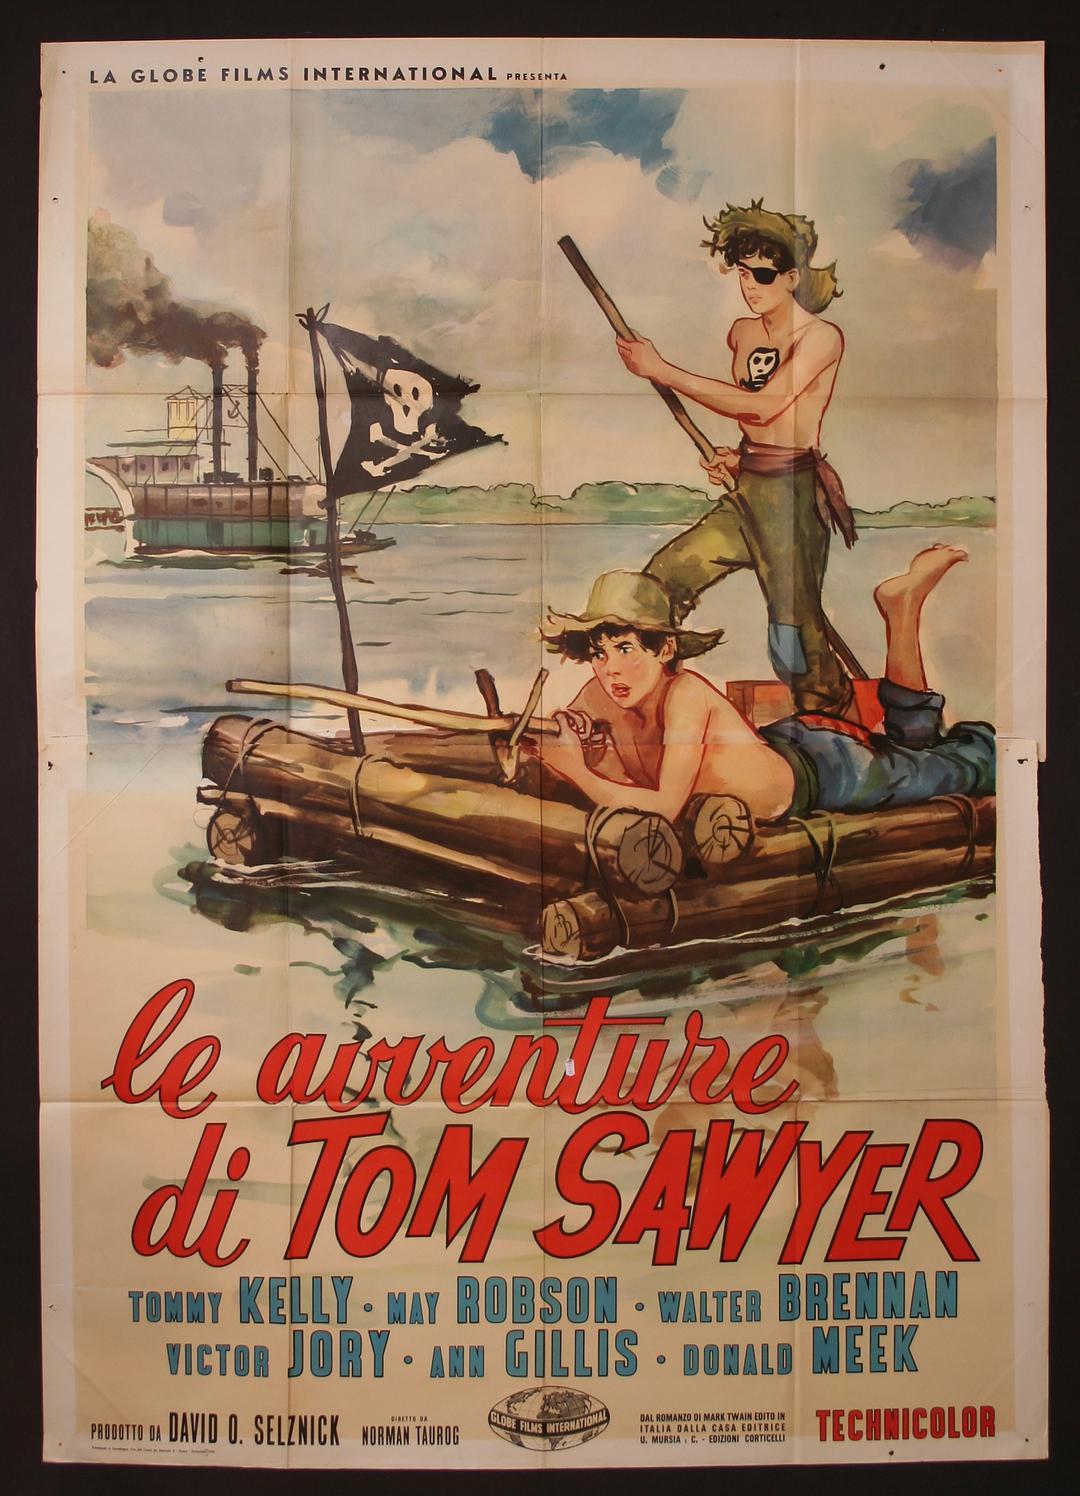 汤姆历险记 1938版